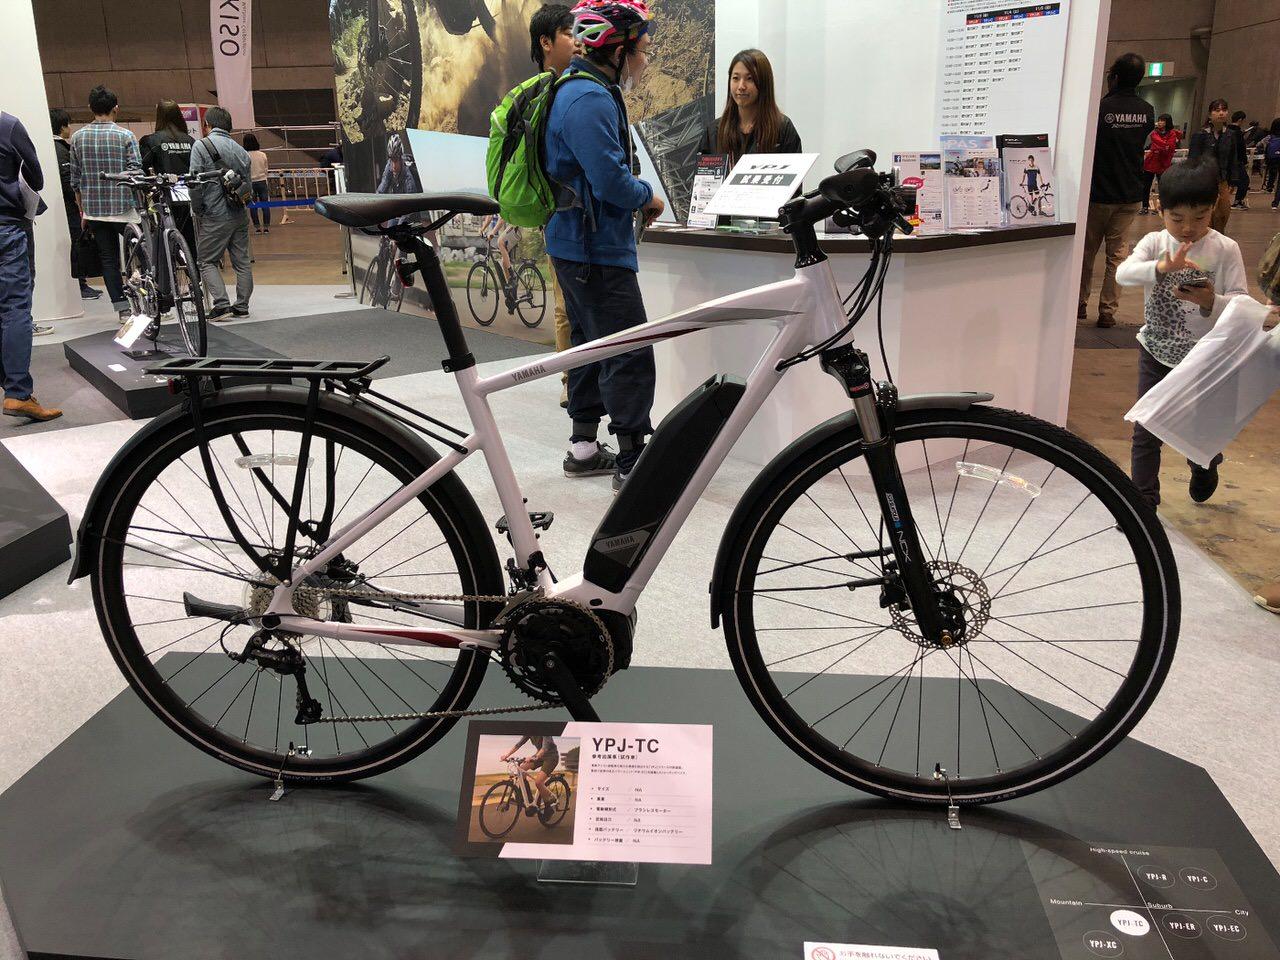 Cyclemode 0461